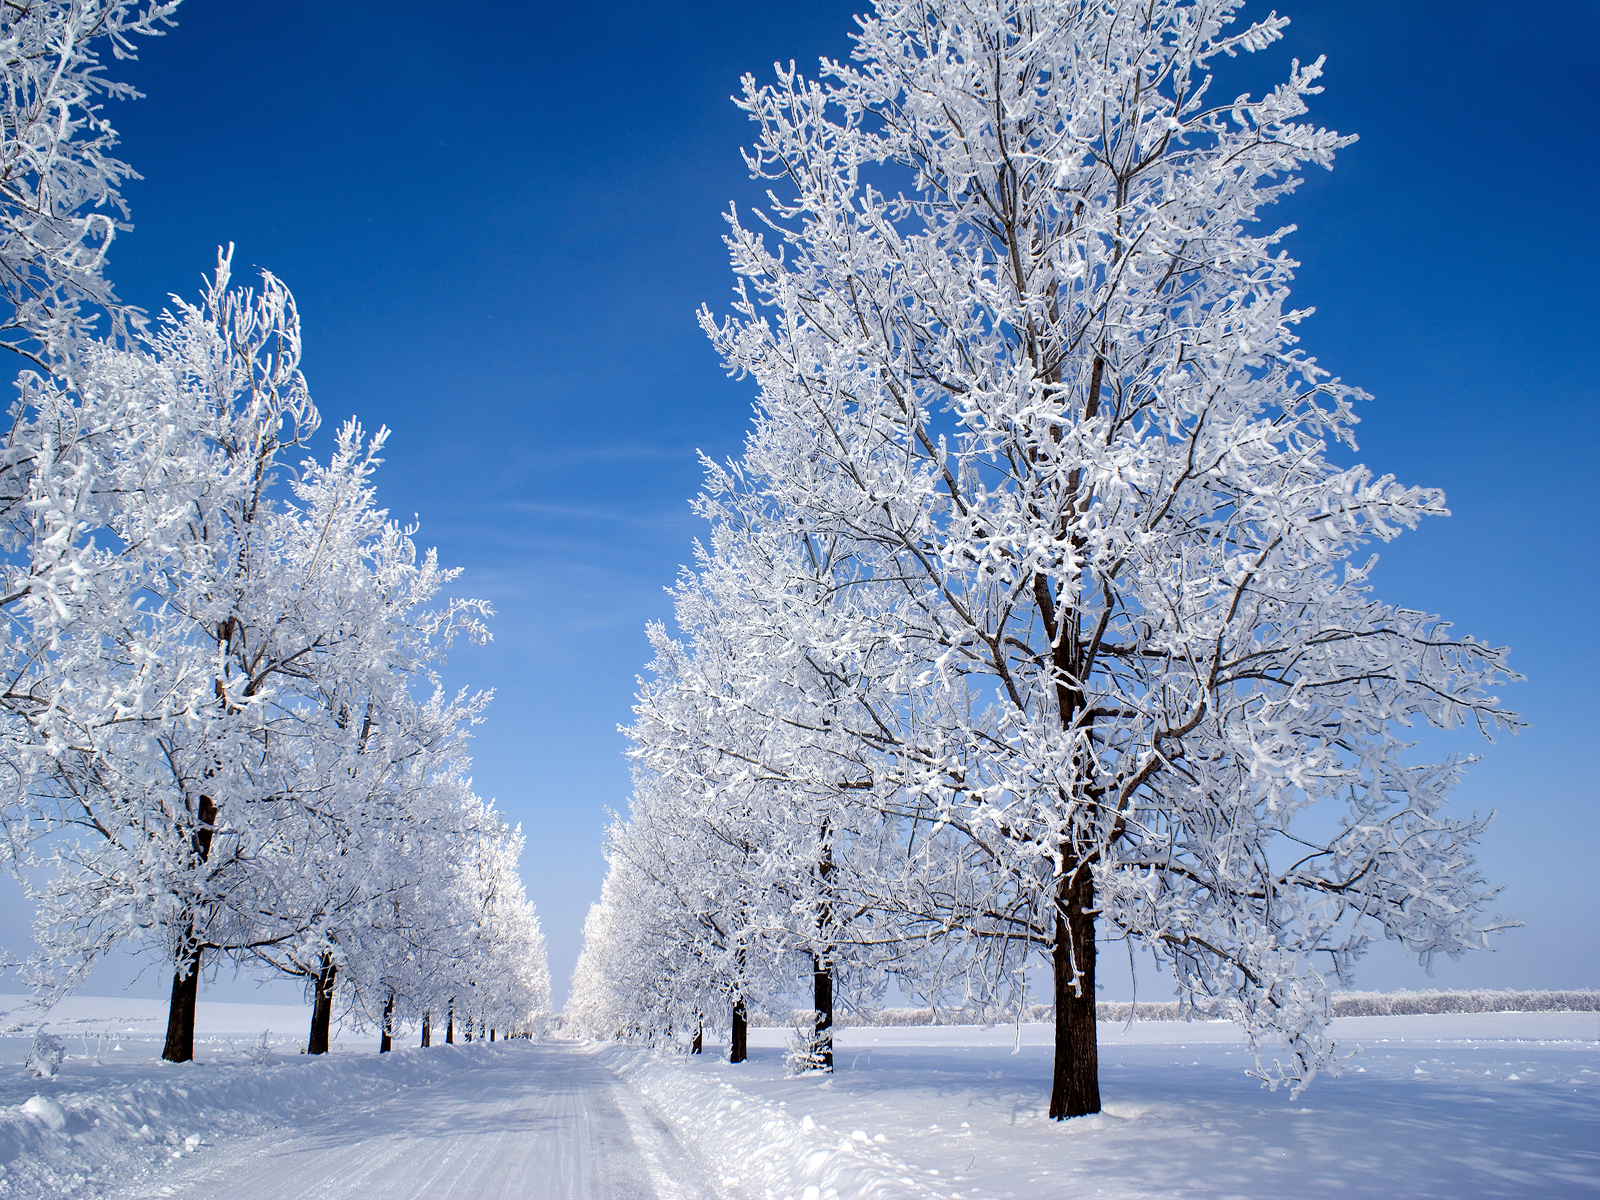 Snežne čarolije Country%2Blane%2Bwinter%2Bsnow%2Bwall%2Binkbluesky